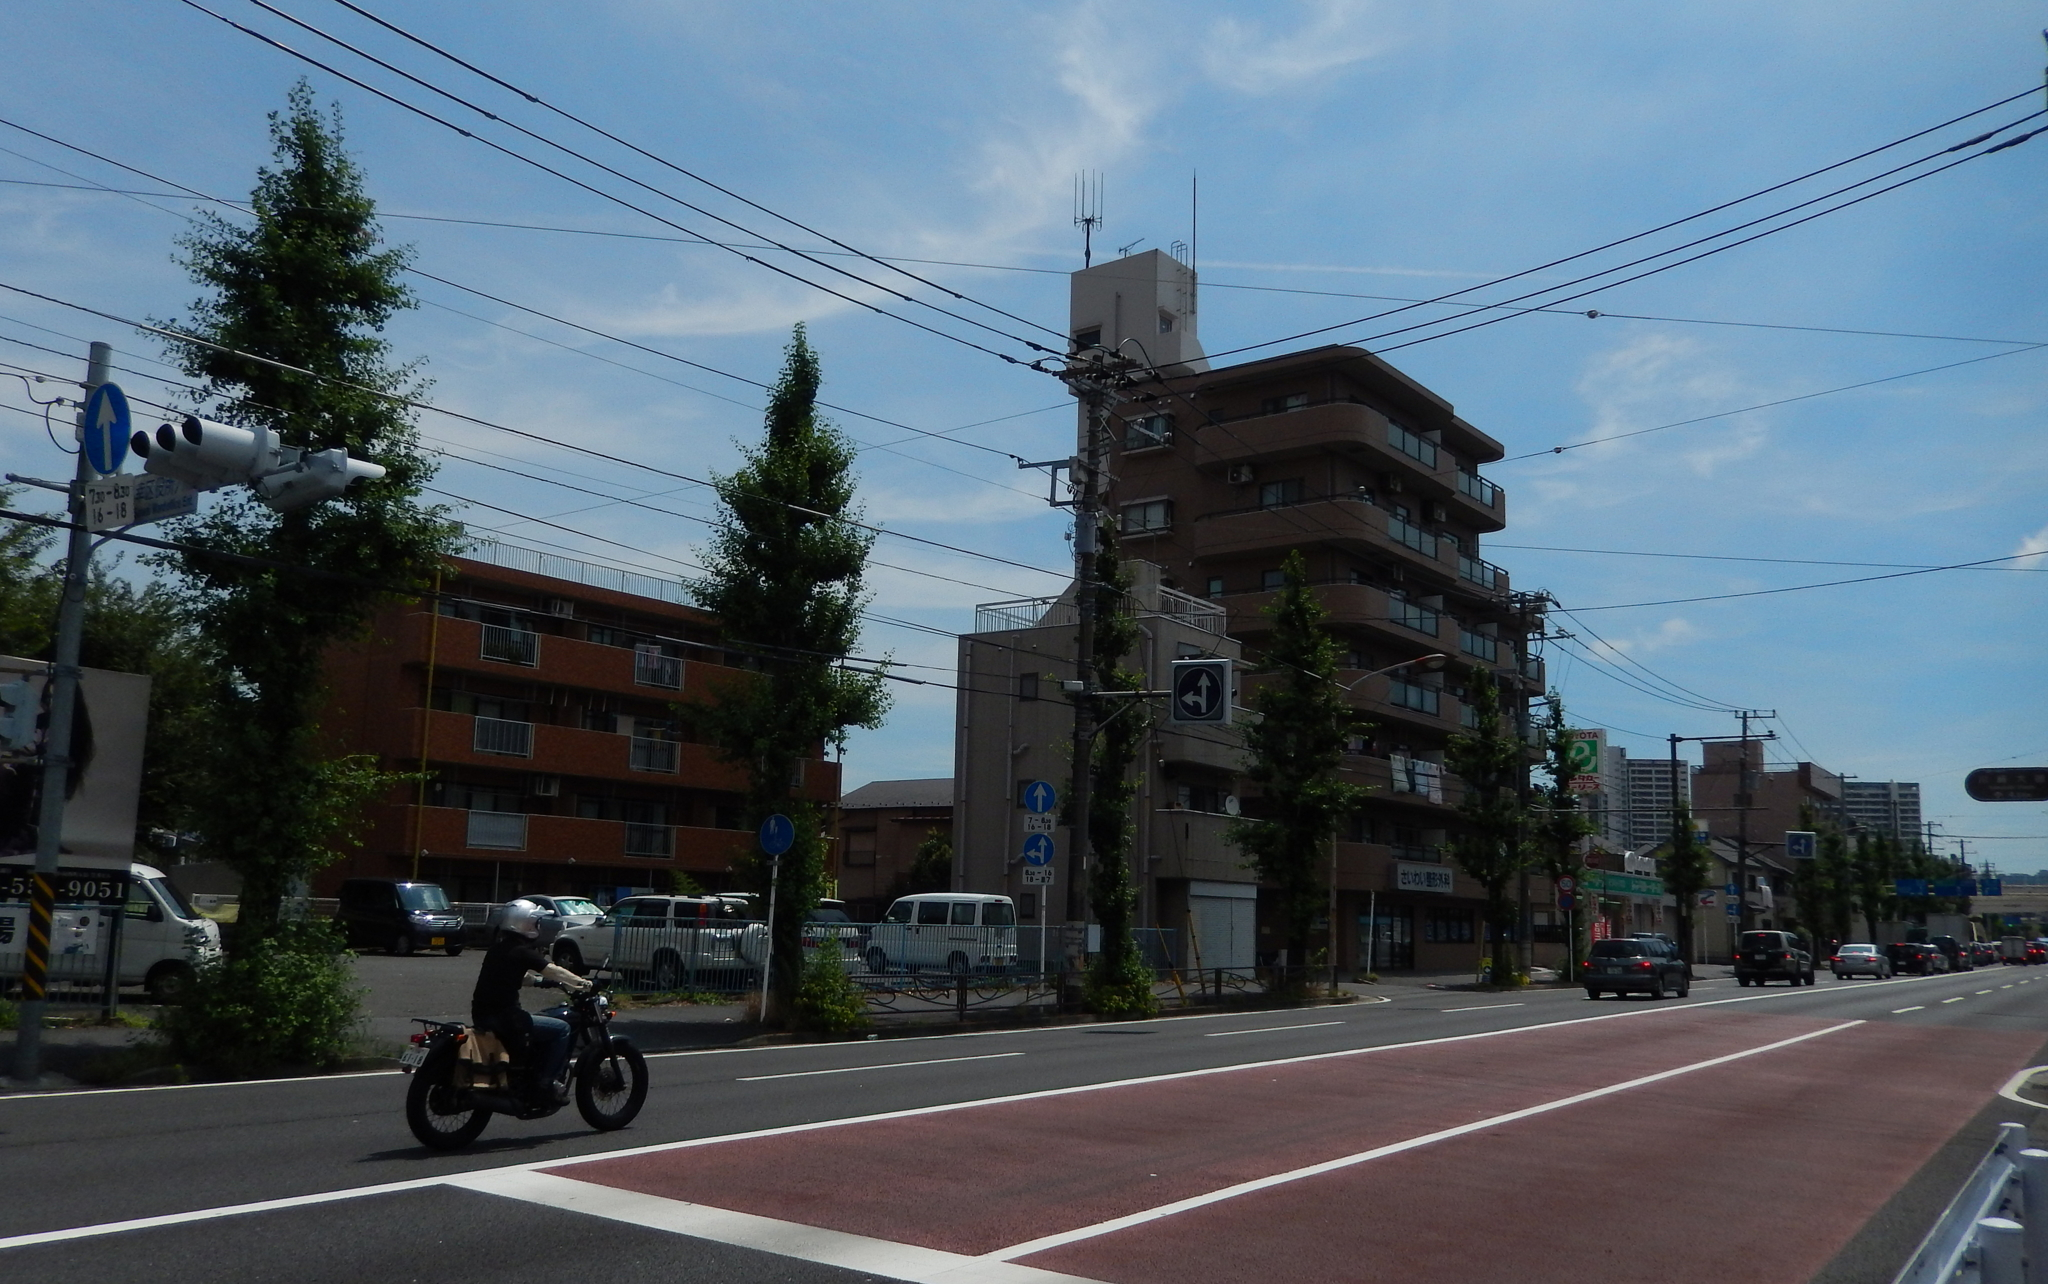 f:id:ToshUeno:20160710100726j:plain